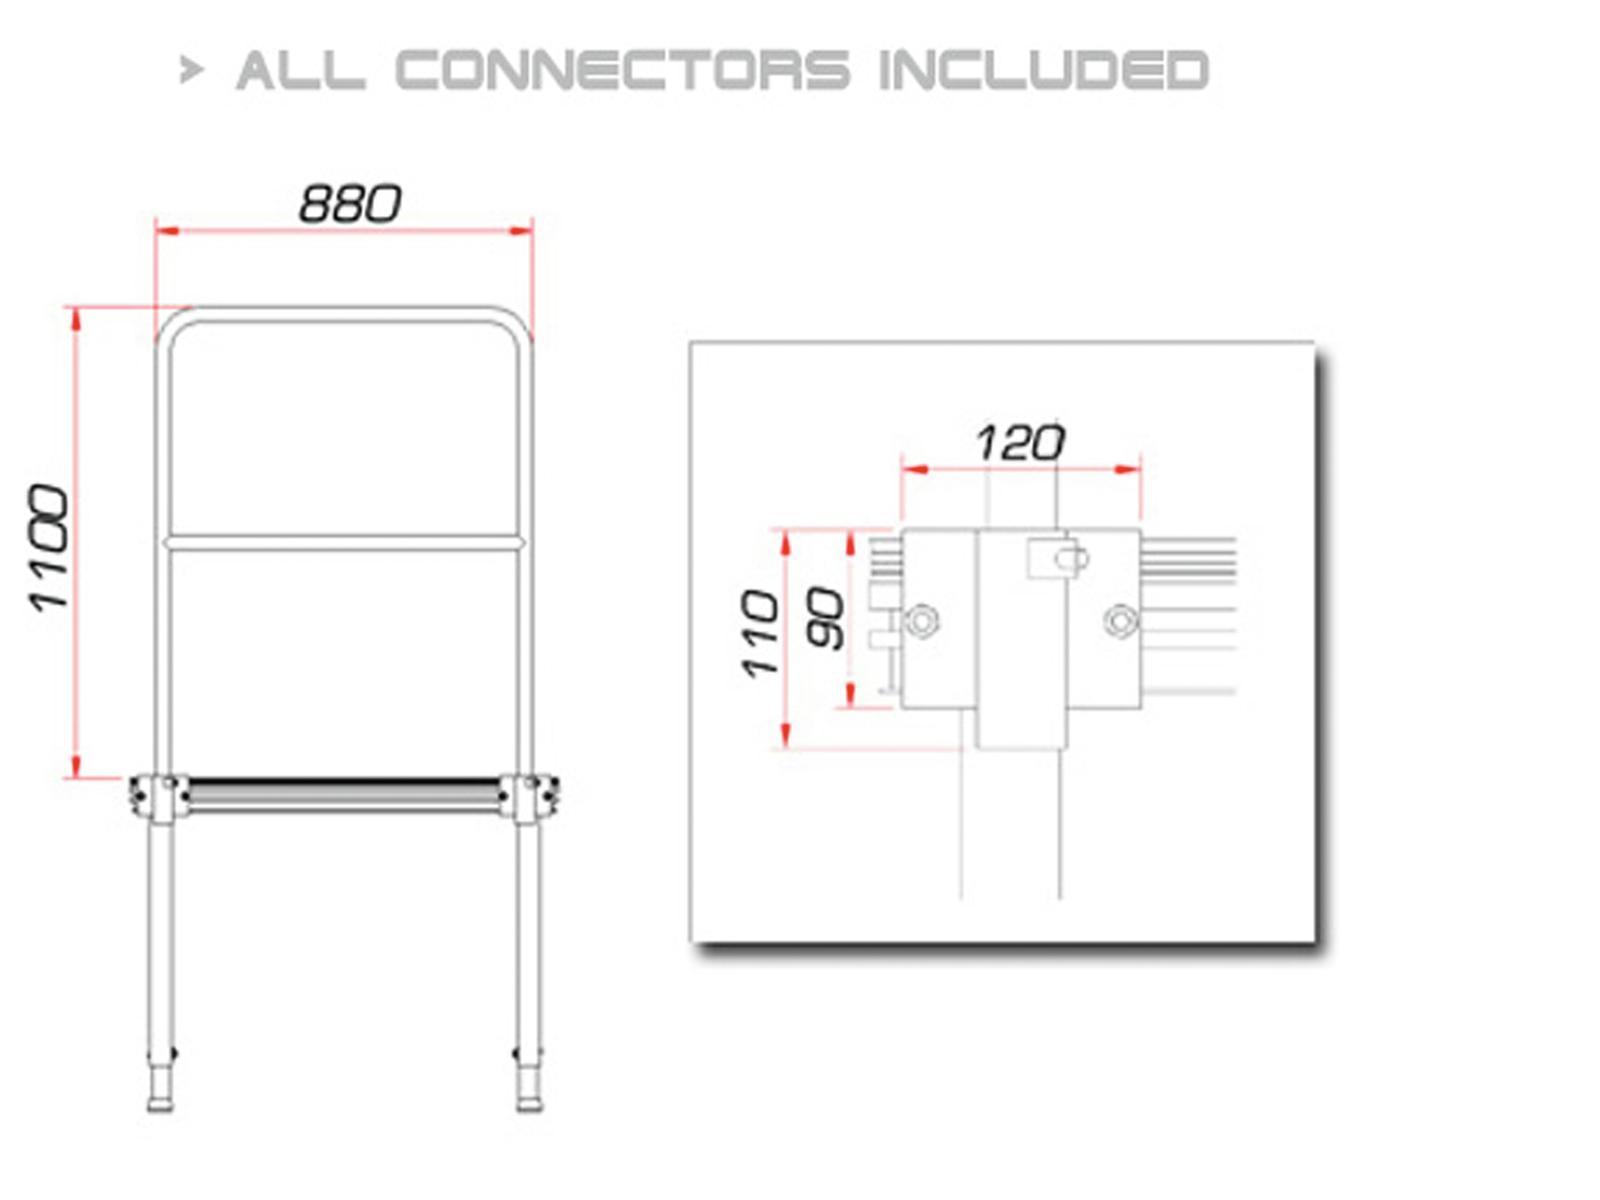 GUIL TMQ-01/440 Bühnengeländer 88cm (Aluminiumversion)